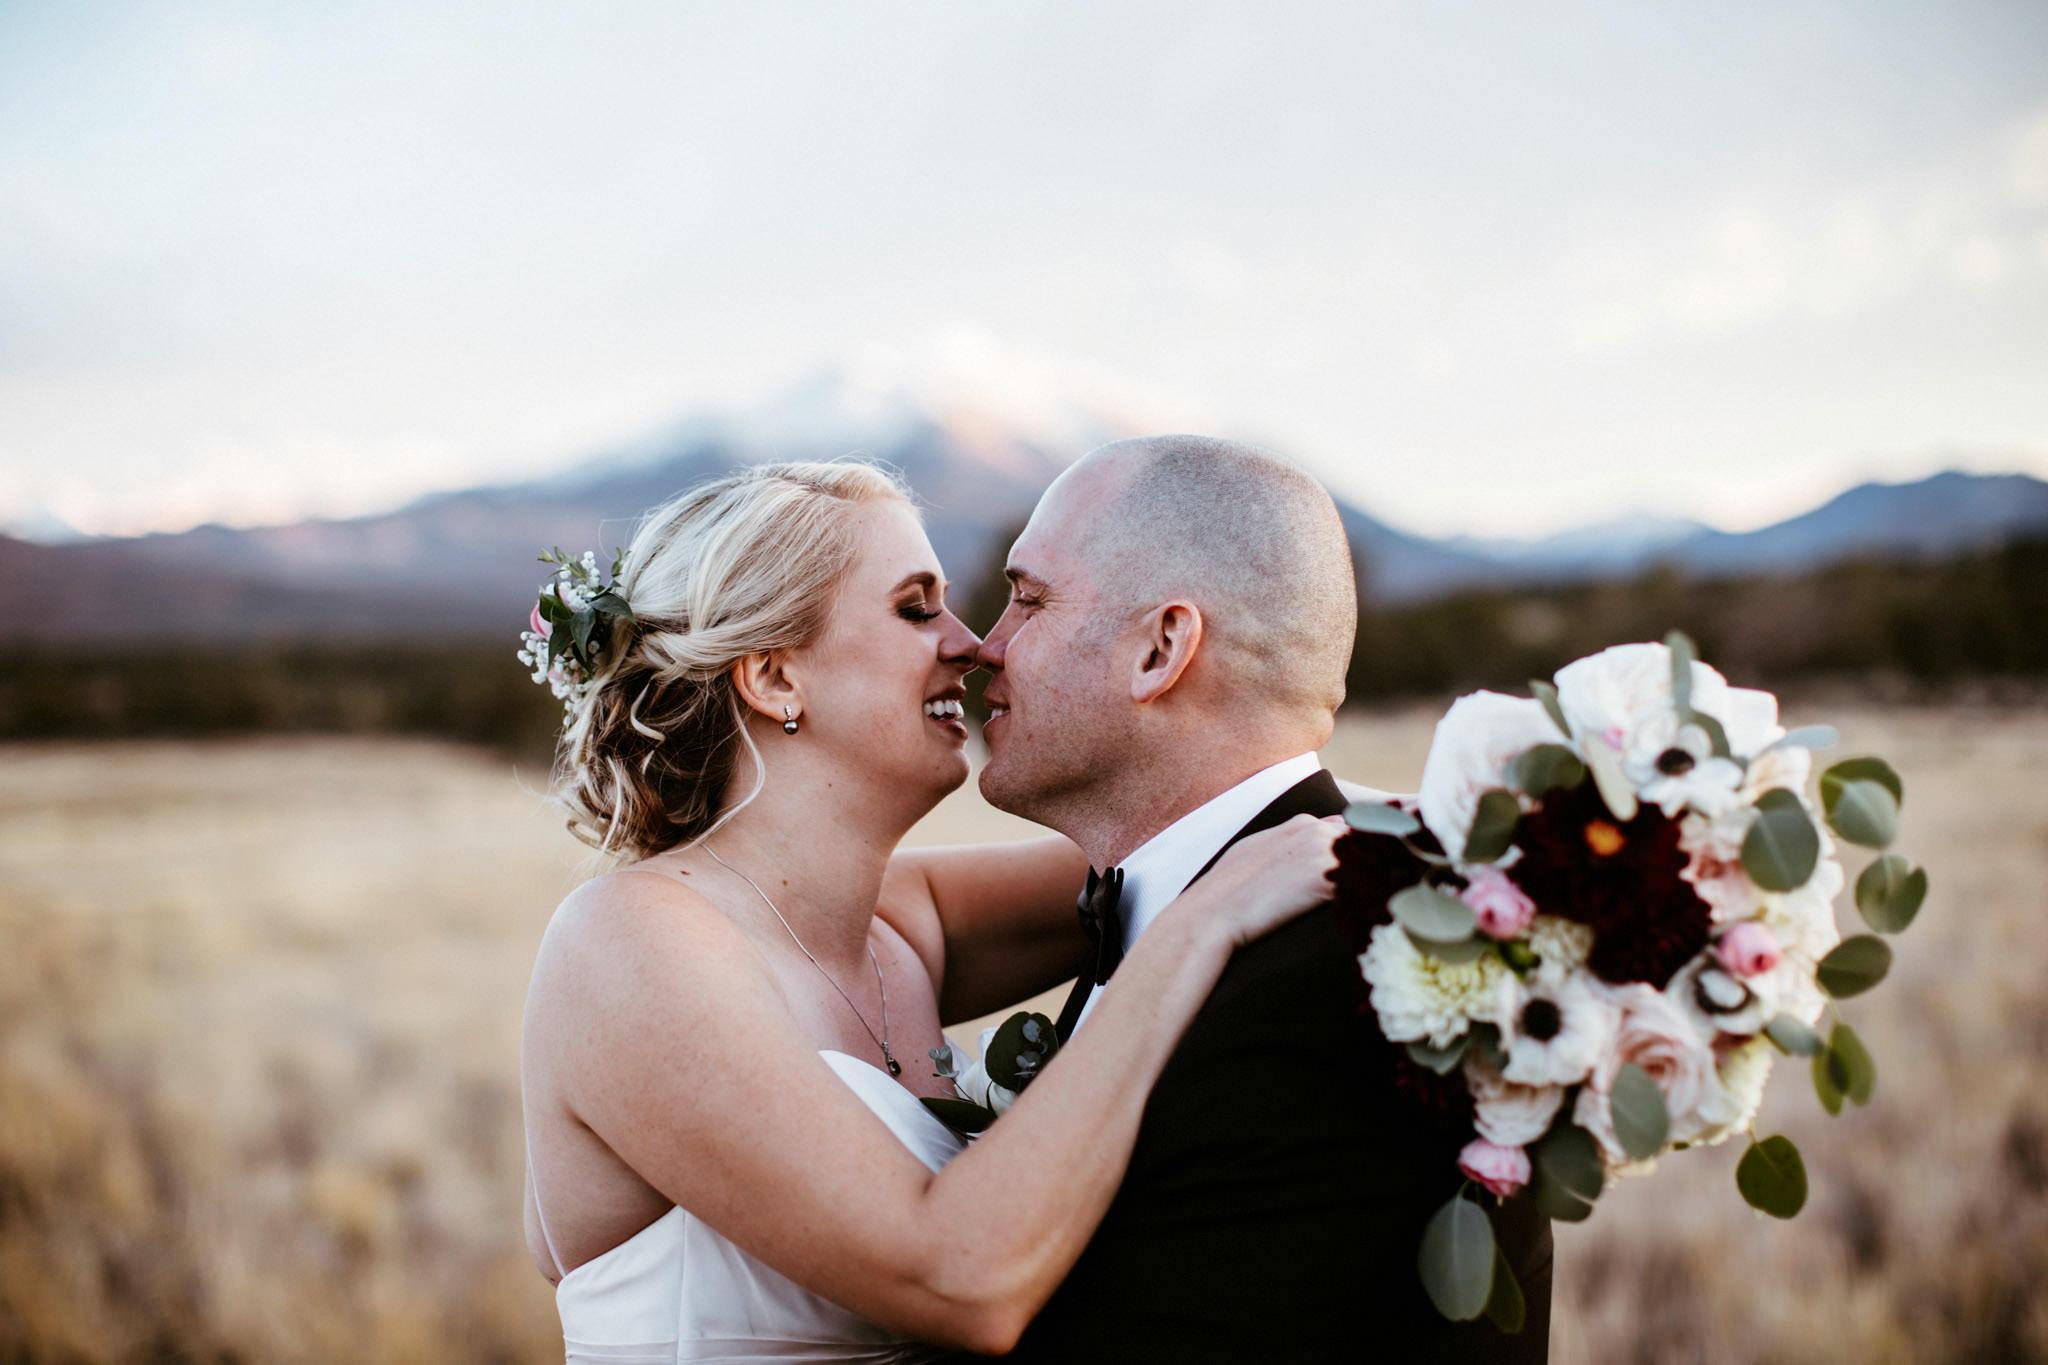 07Aspen Colorado Wedding_Kindling Wedding Photography_08.JPG